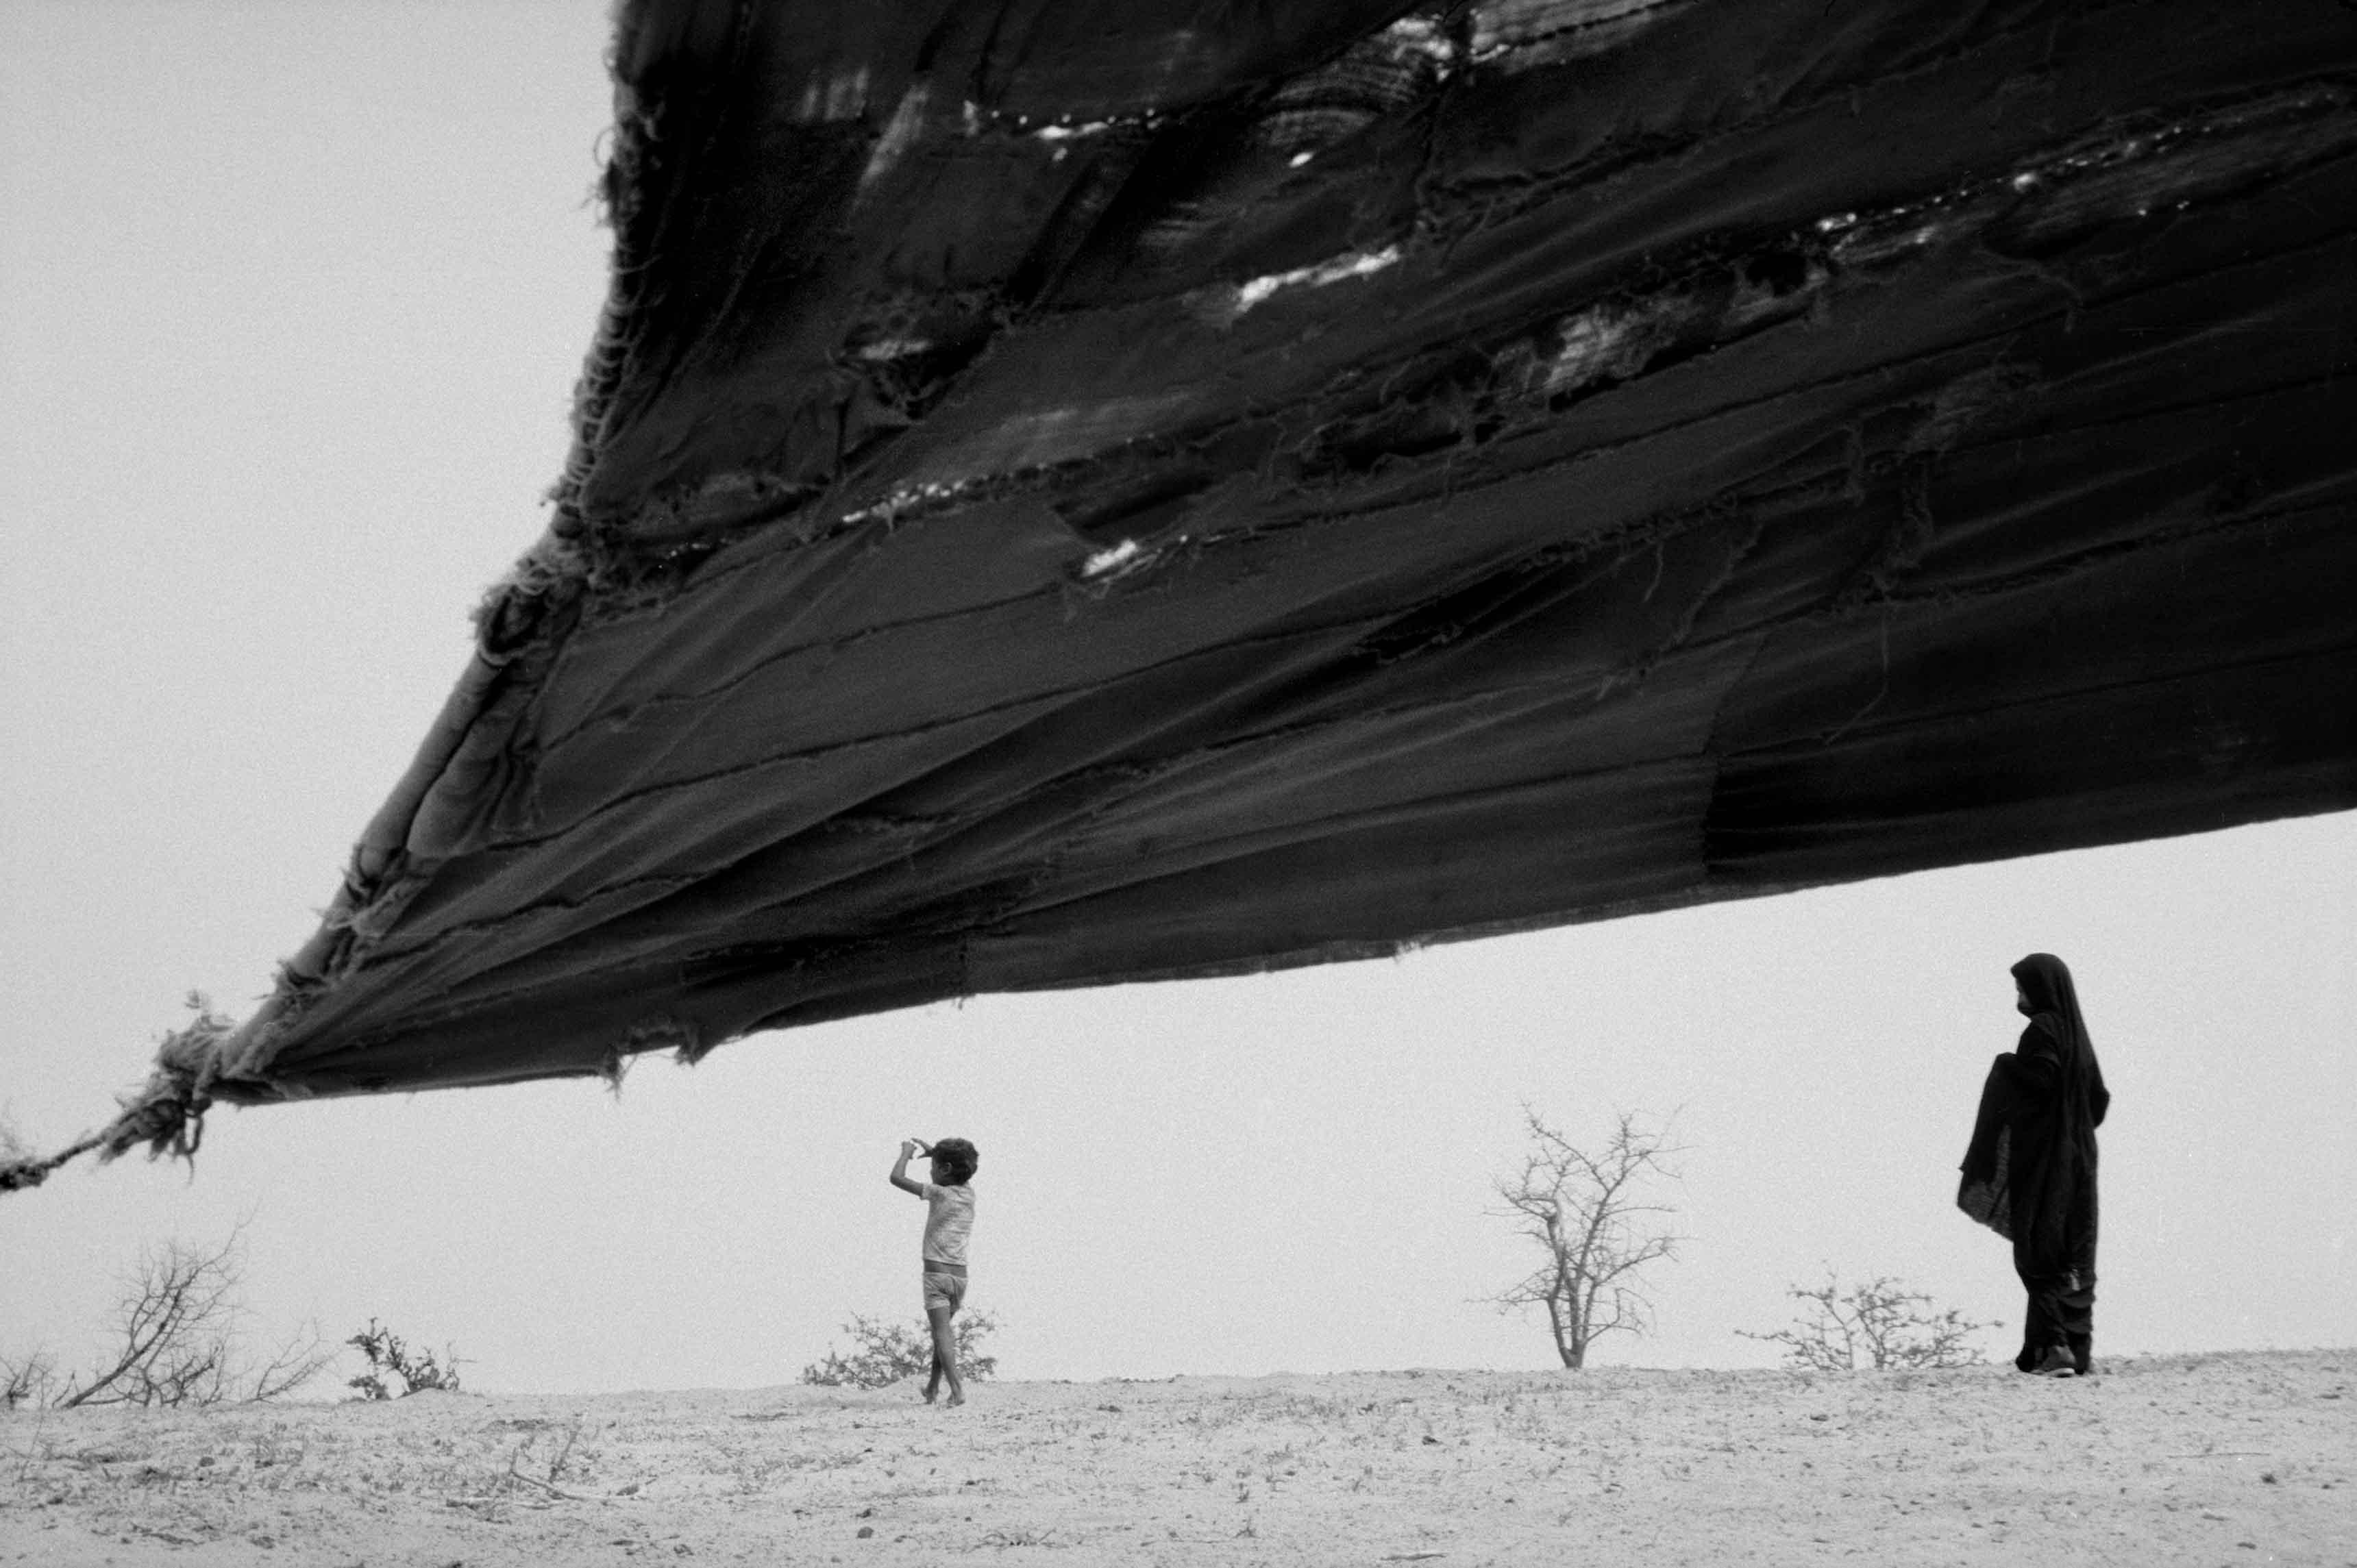 Mauritanie, entre Oualata et Néma, 1986 © Raymond Depardon / Magnum Photos